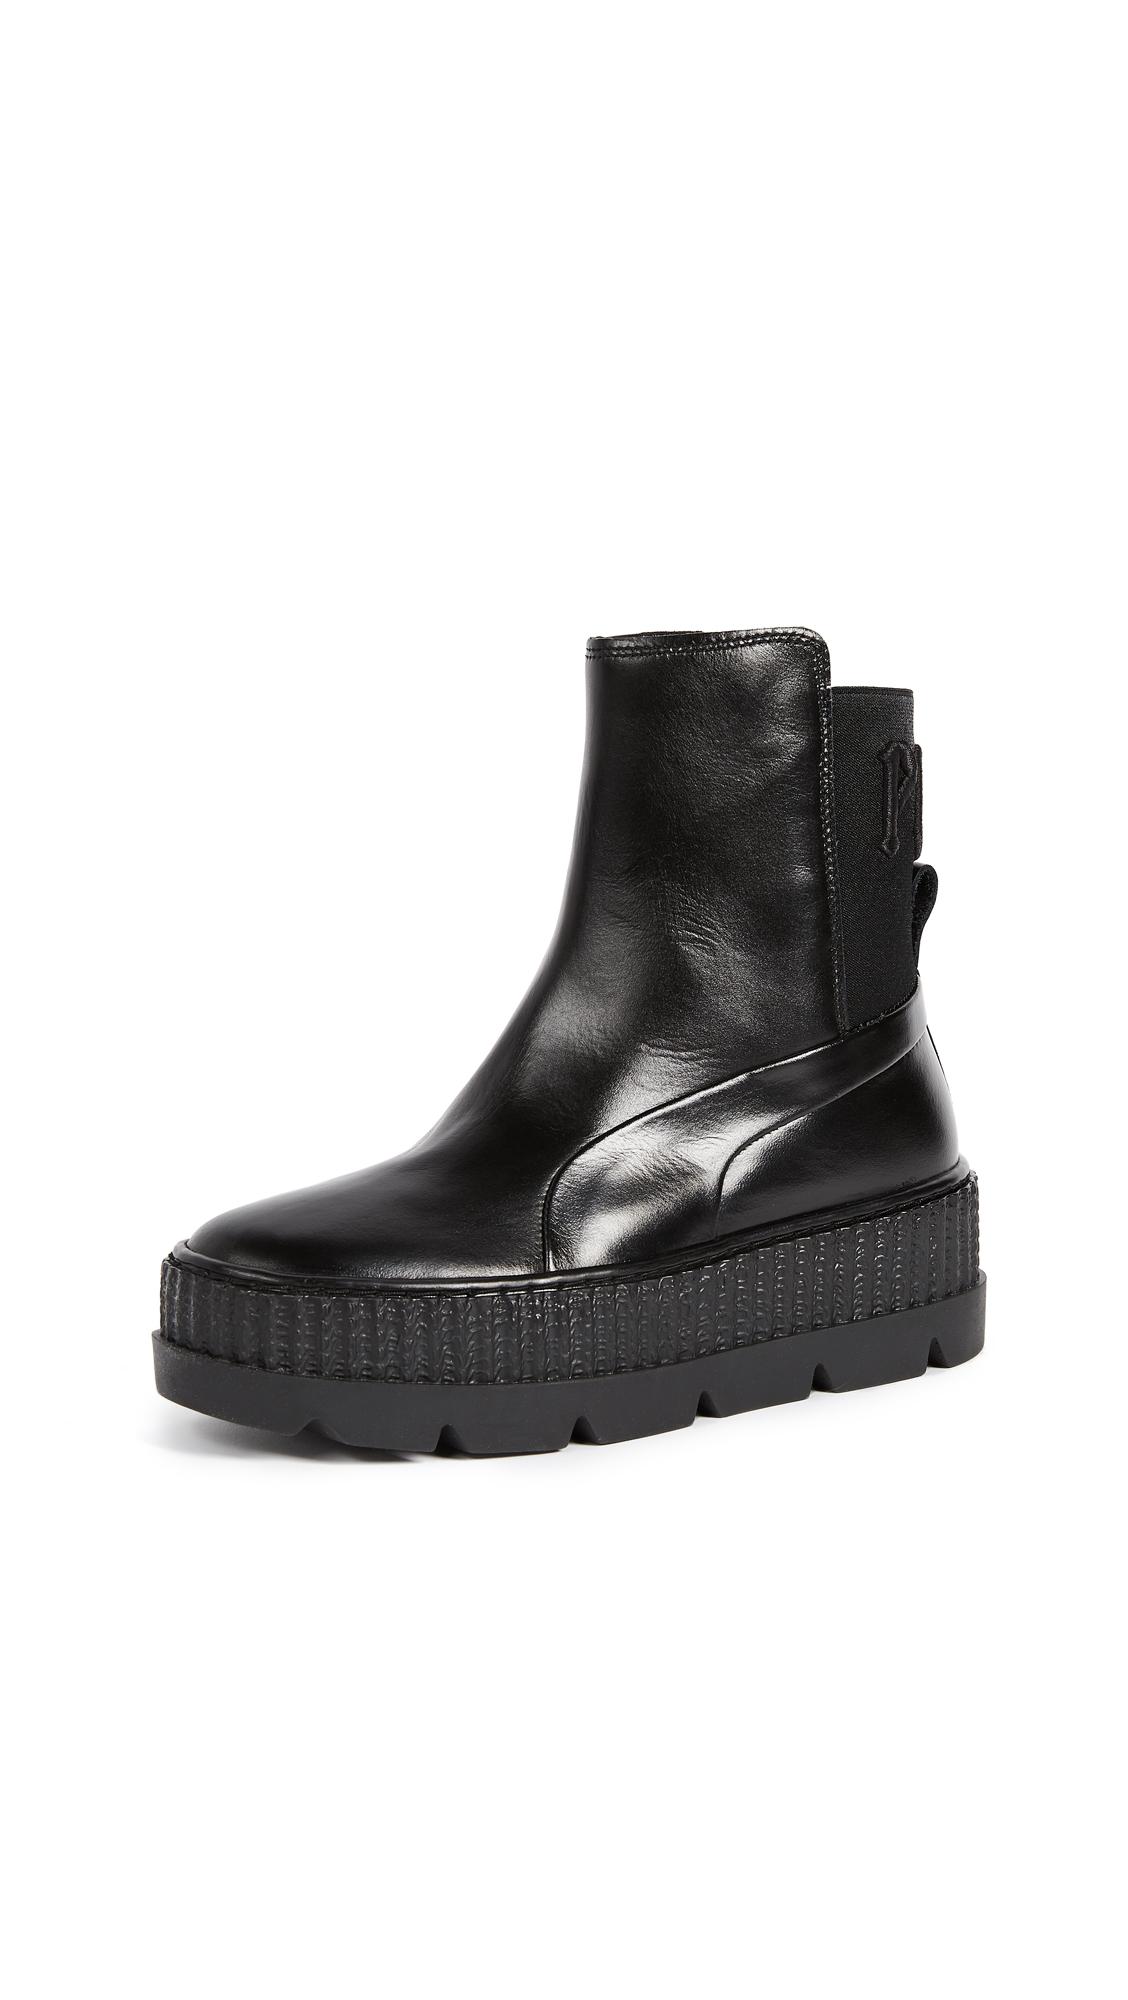 PUMA FENTY x PUMA Chelsea Sneaker Boots - Puma Black